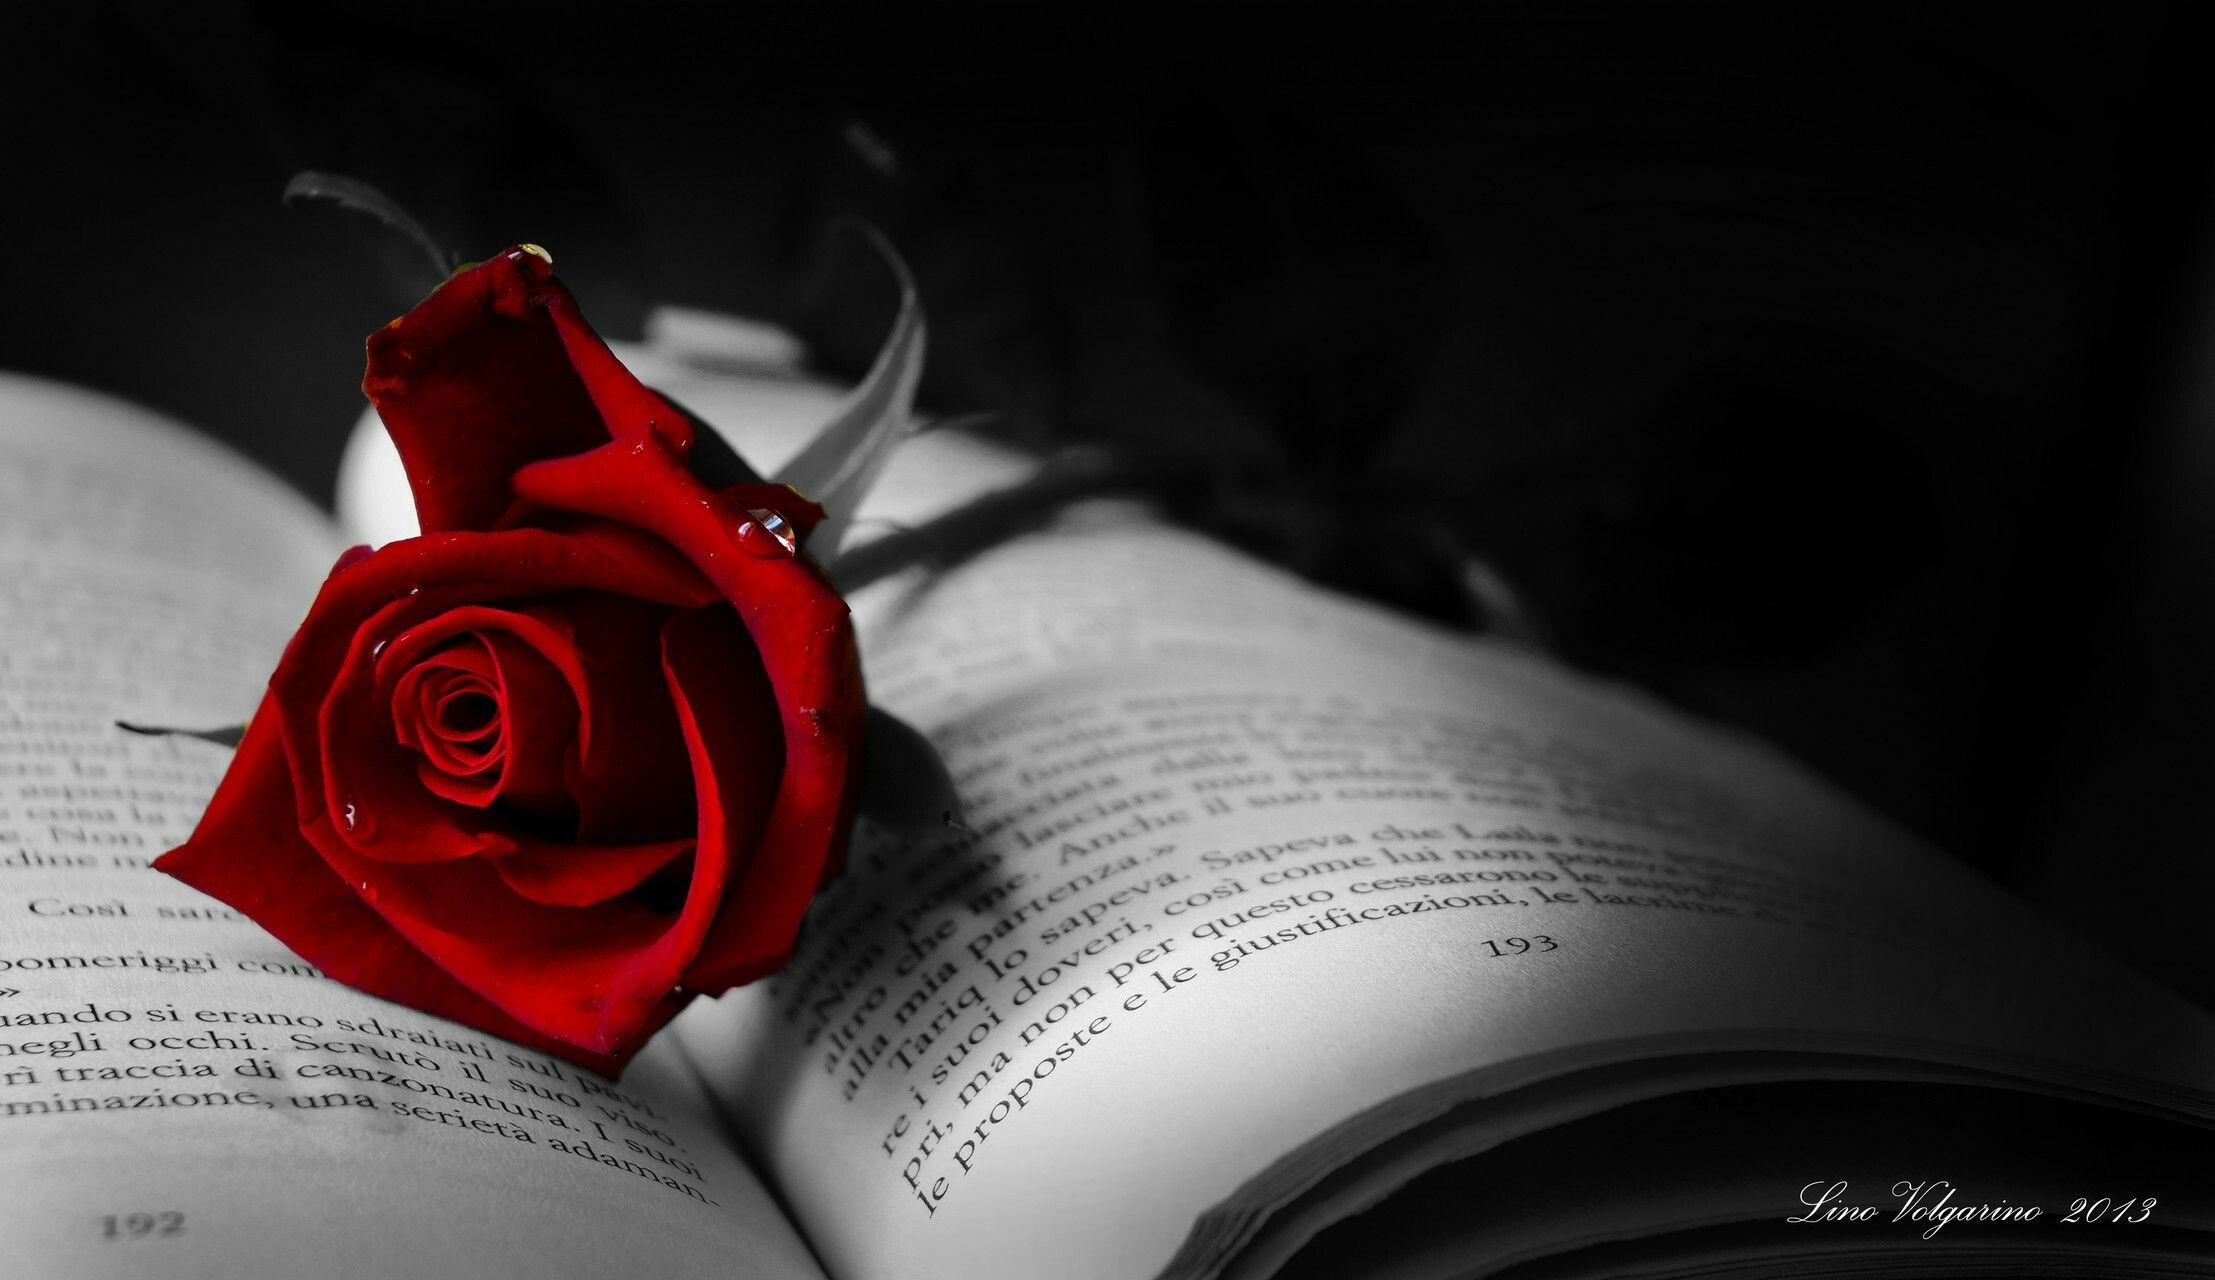 Pin By Hajar Nasser On Mnr Rose Wallpaper Dark Red Roses Red Roses